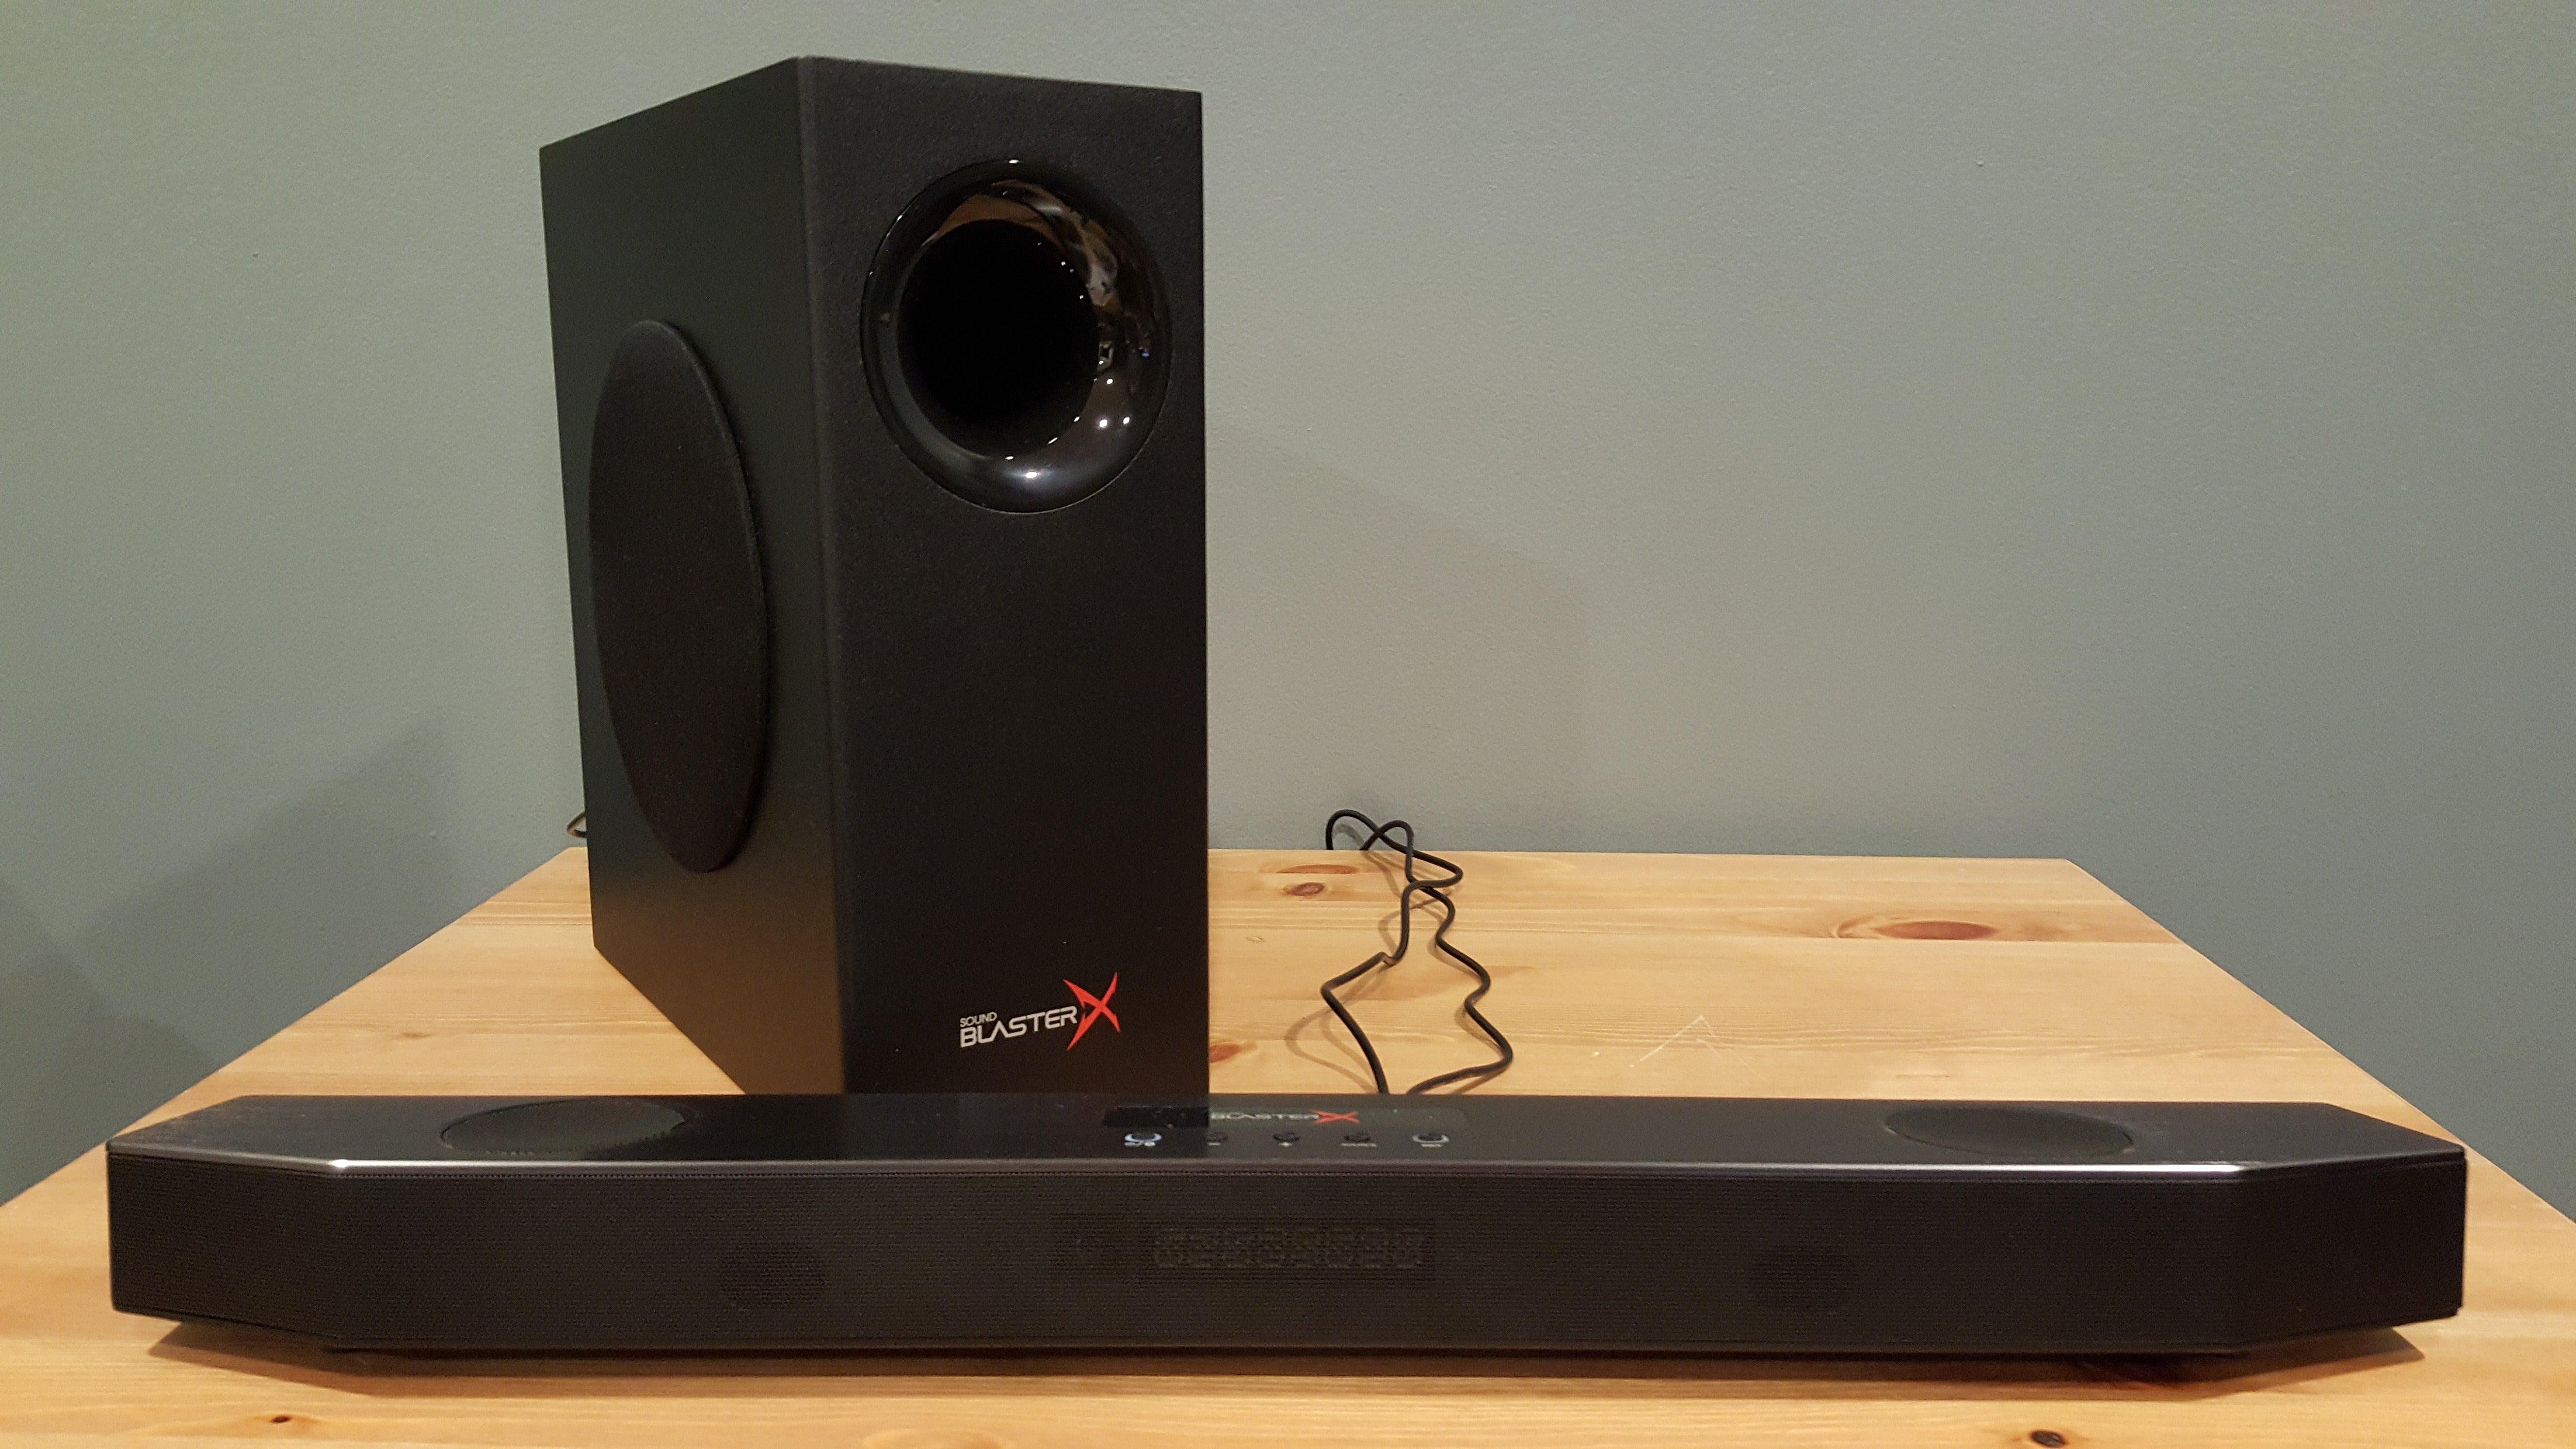 Creative Sound BlasterX Katana review: The soundbar finally makes its way to PCs | PCWorld